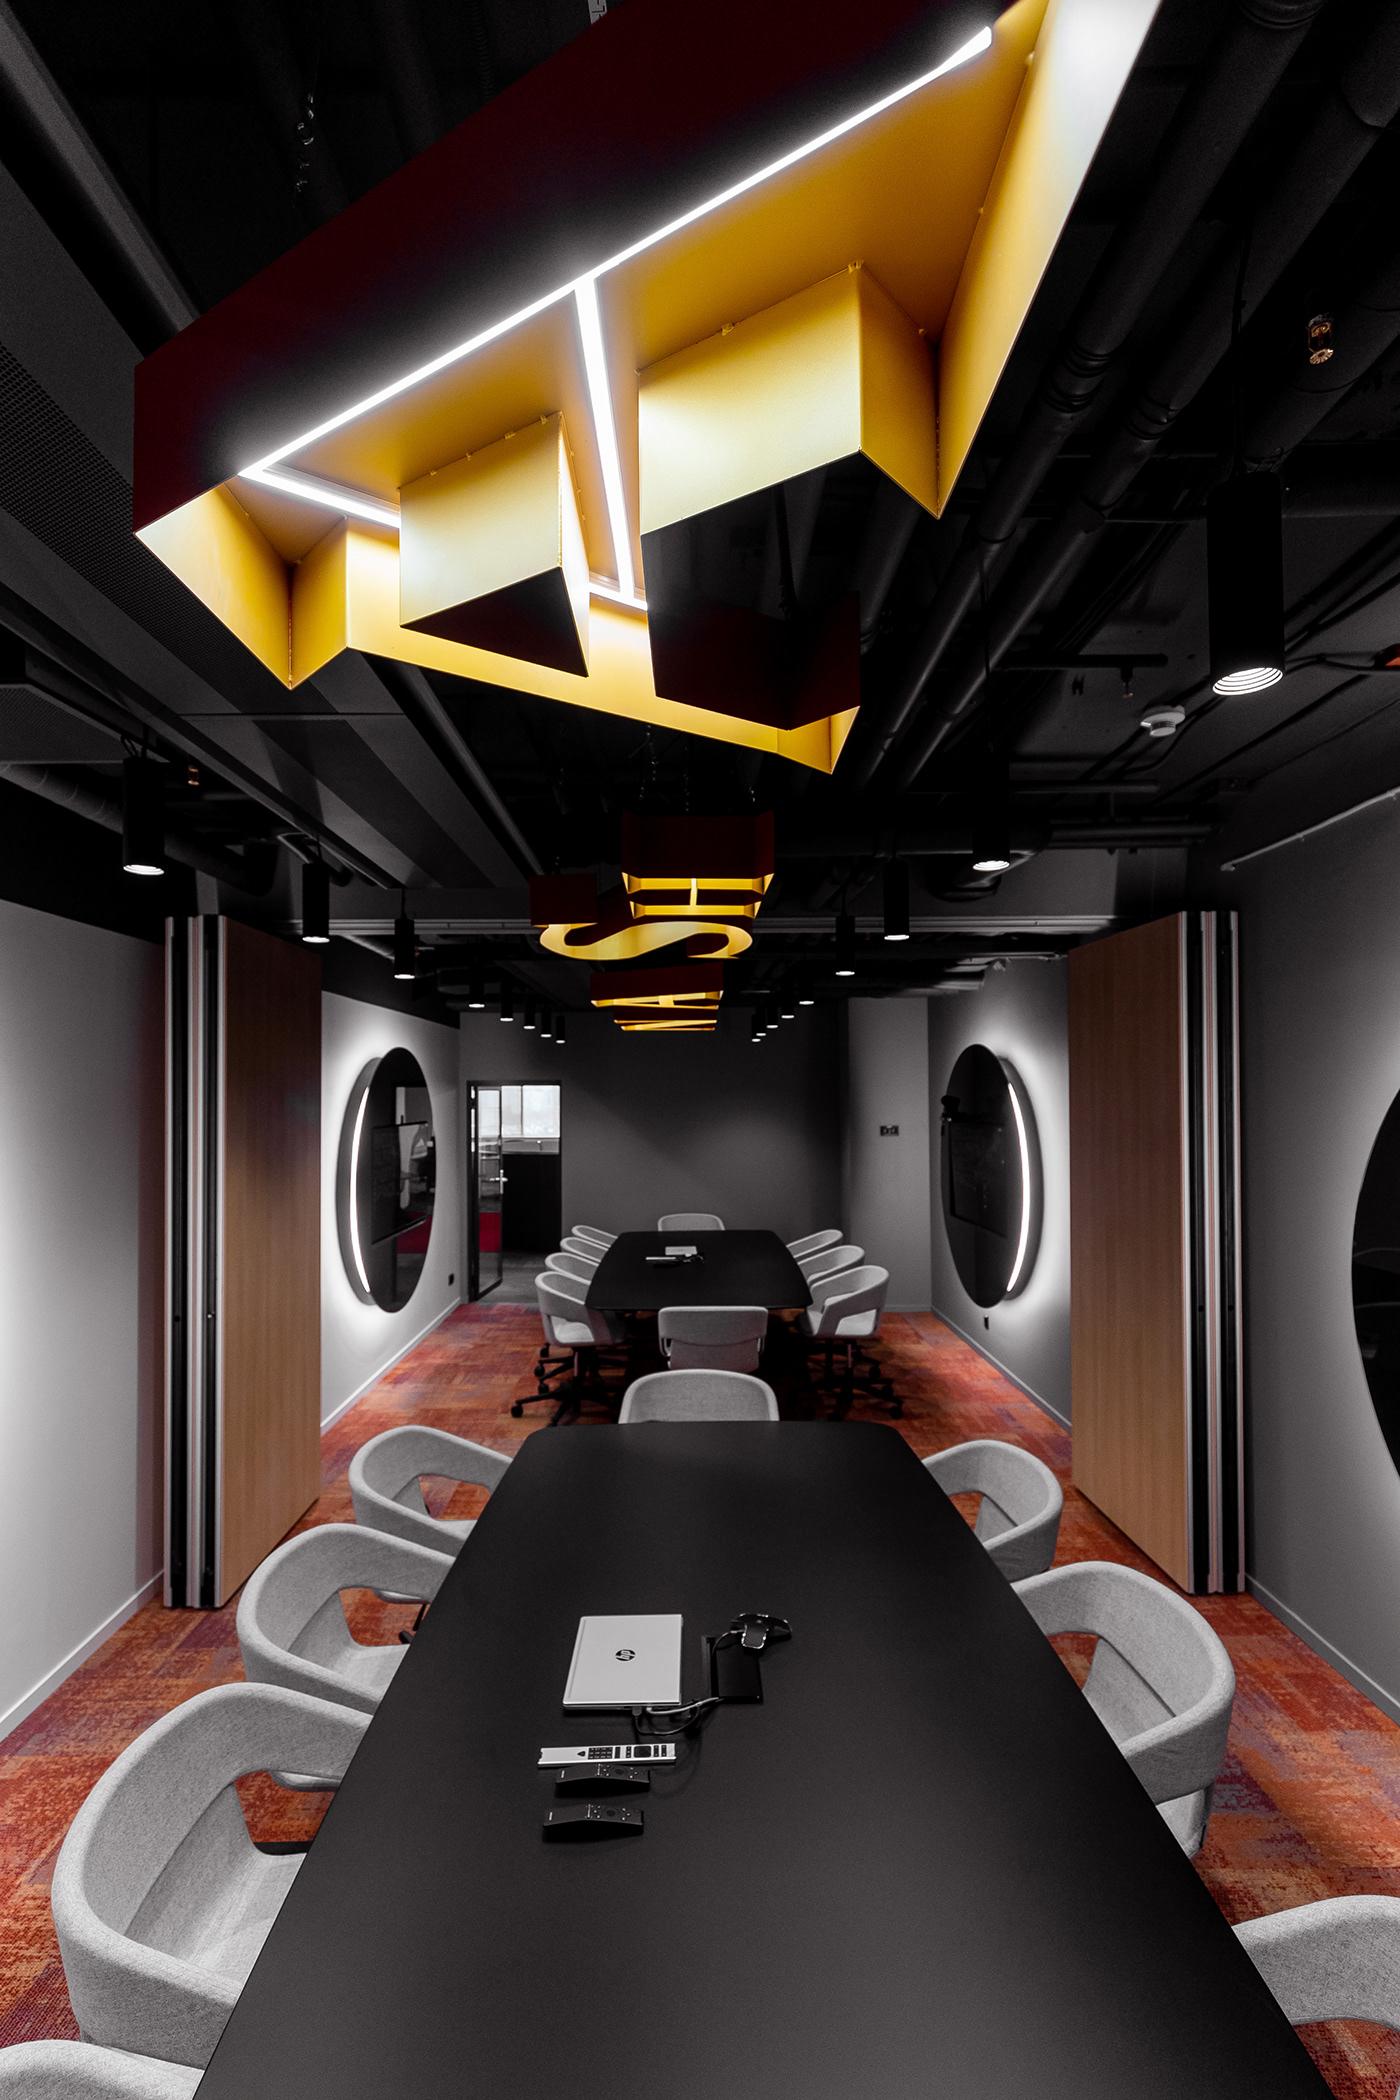 architecture design Interior interior design  Moscow Office Office interior